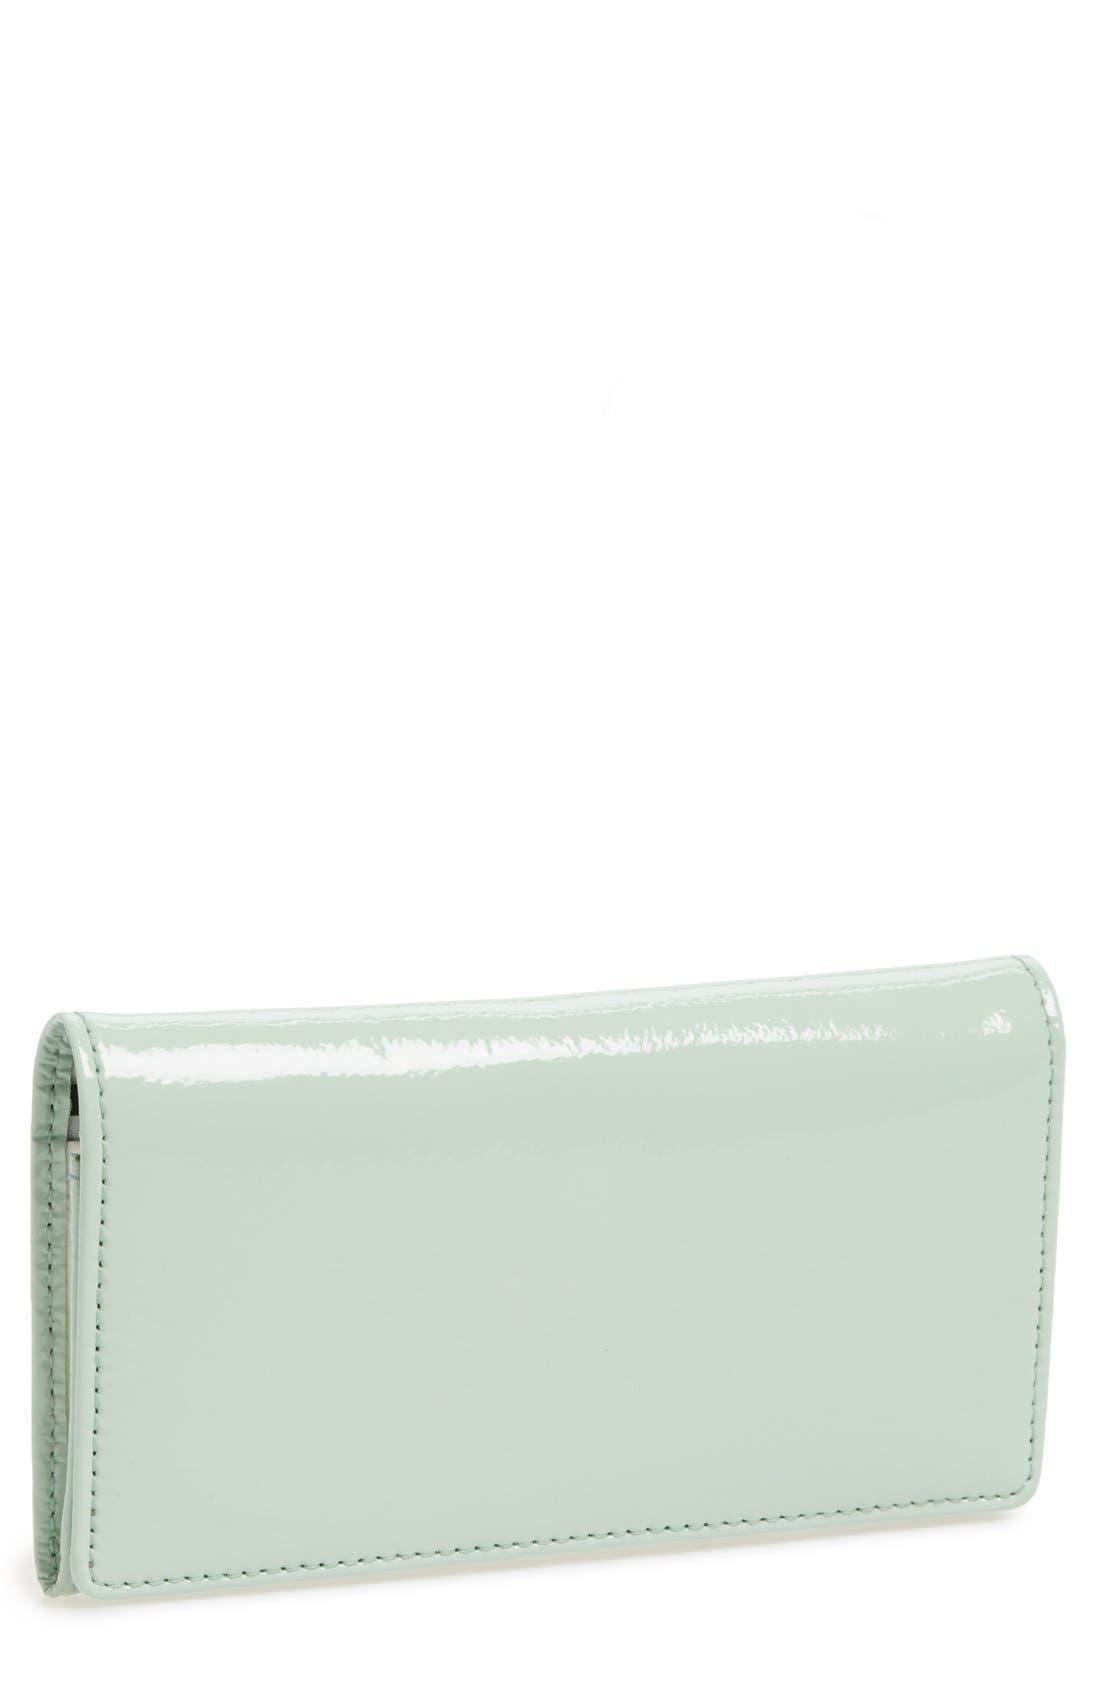 Alternate Image 1 Selected - Halogen® Crinkle Patent Leather Phone Wallet